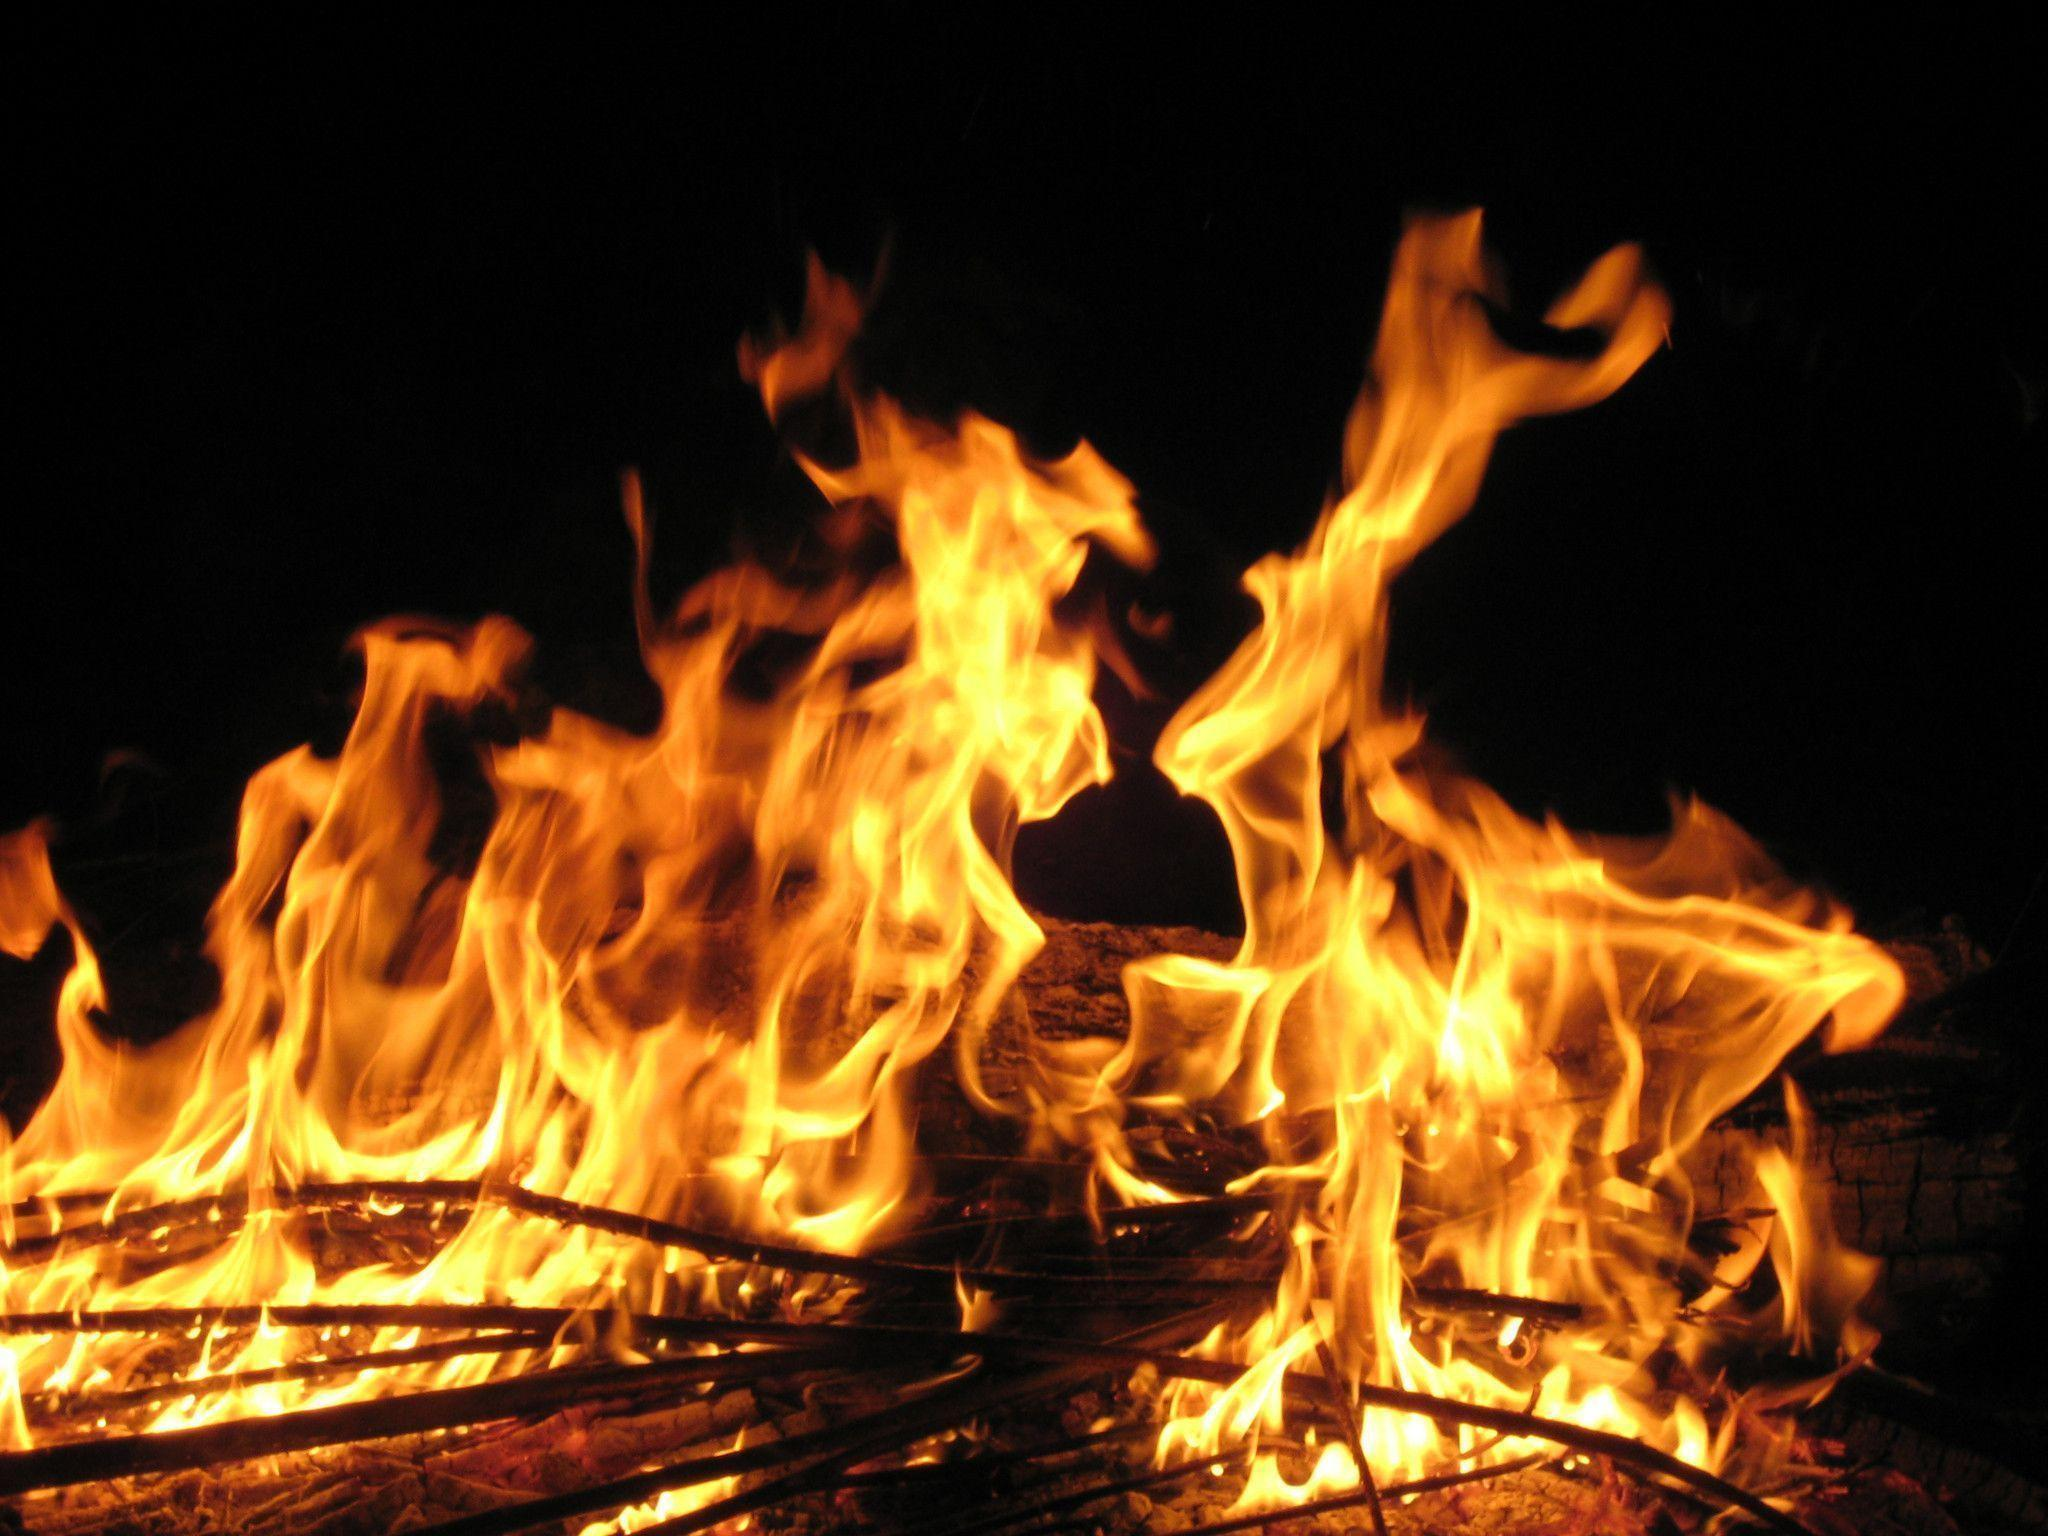 Desktop Fireplace Part - 47: Fireplace Desktop Wallpapers FREE On Latoro.com